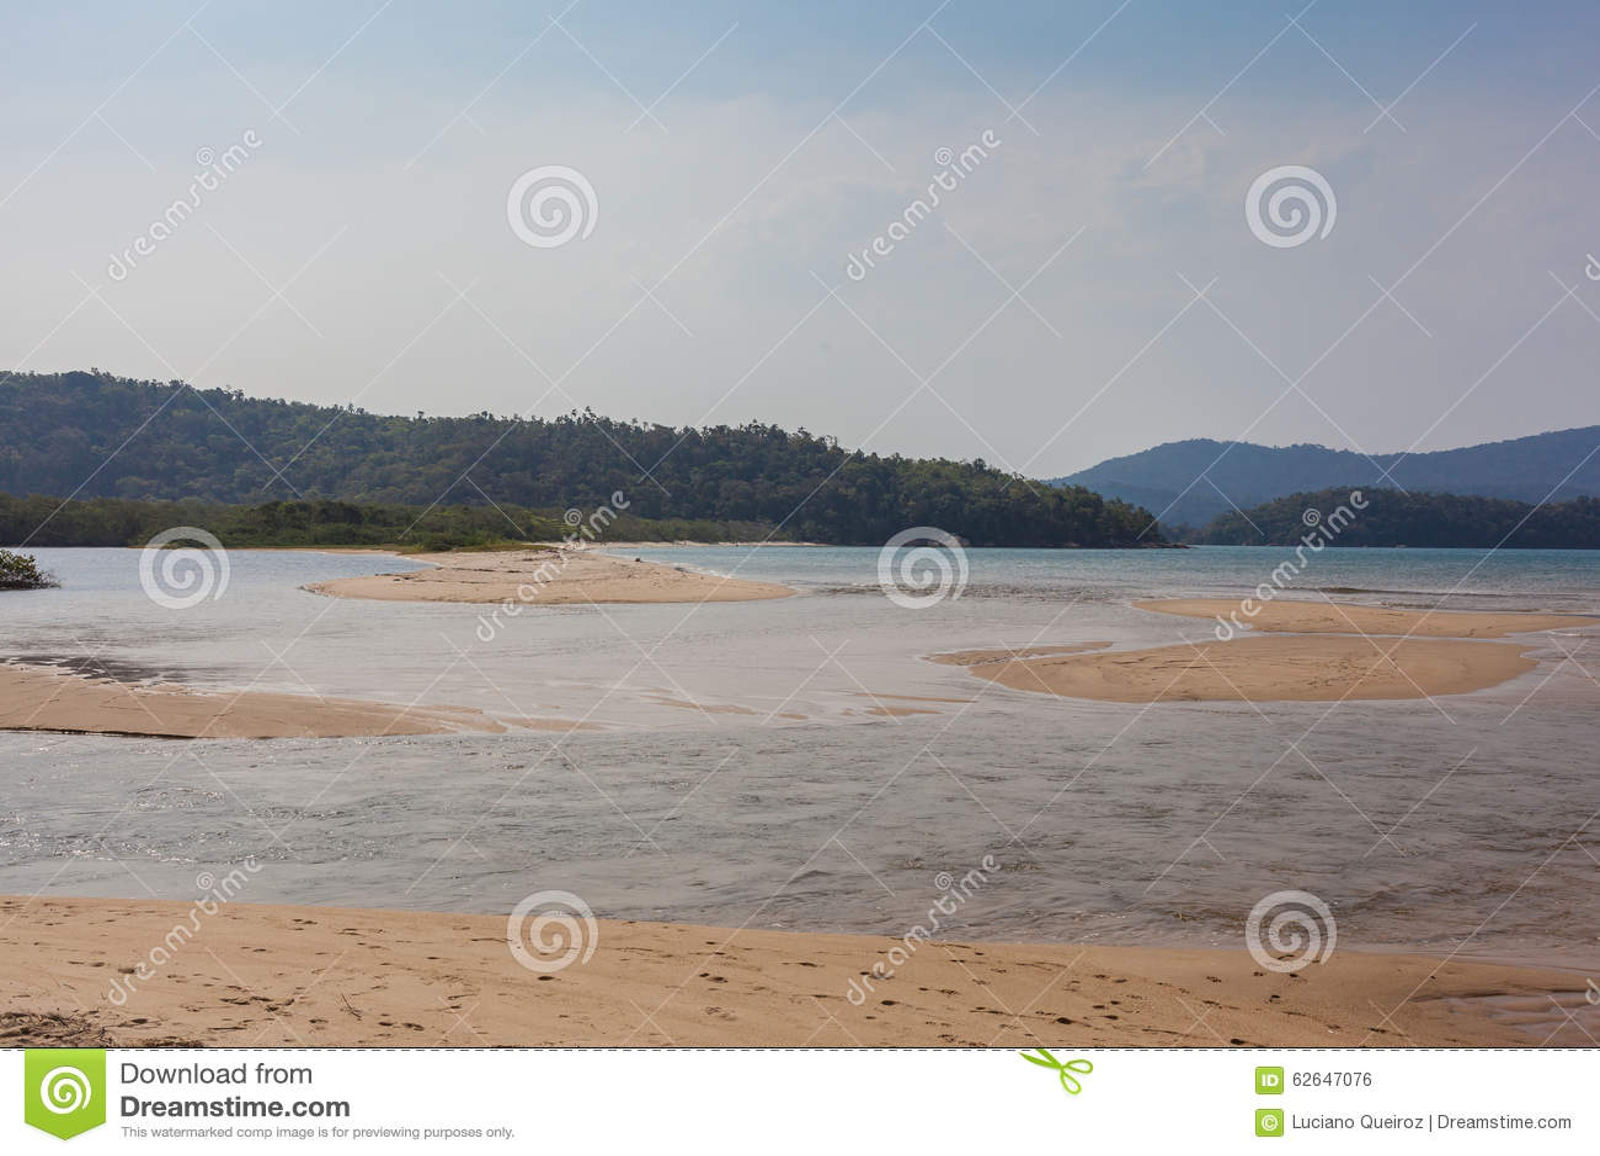 Spiaggia di Paraty Mirim - Paraty - RJ - Brasile